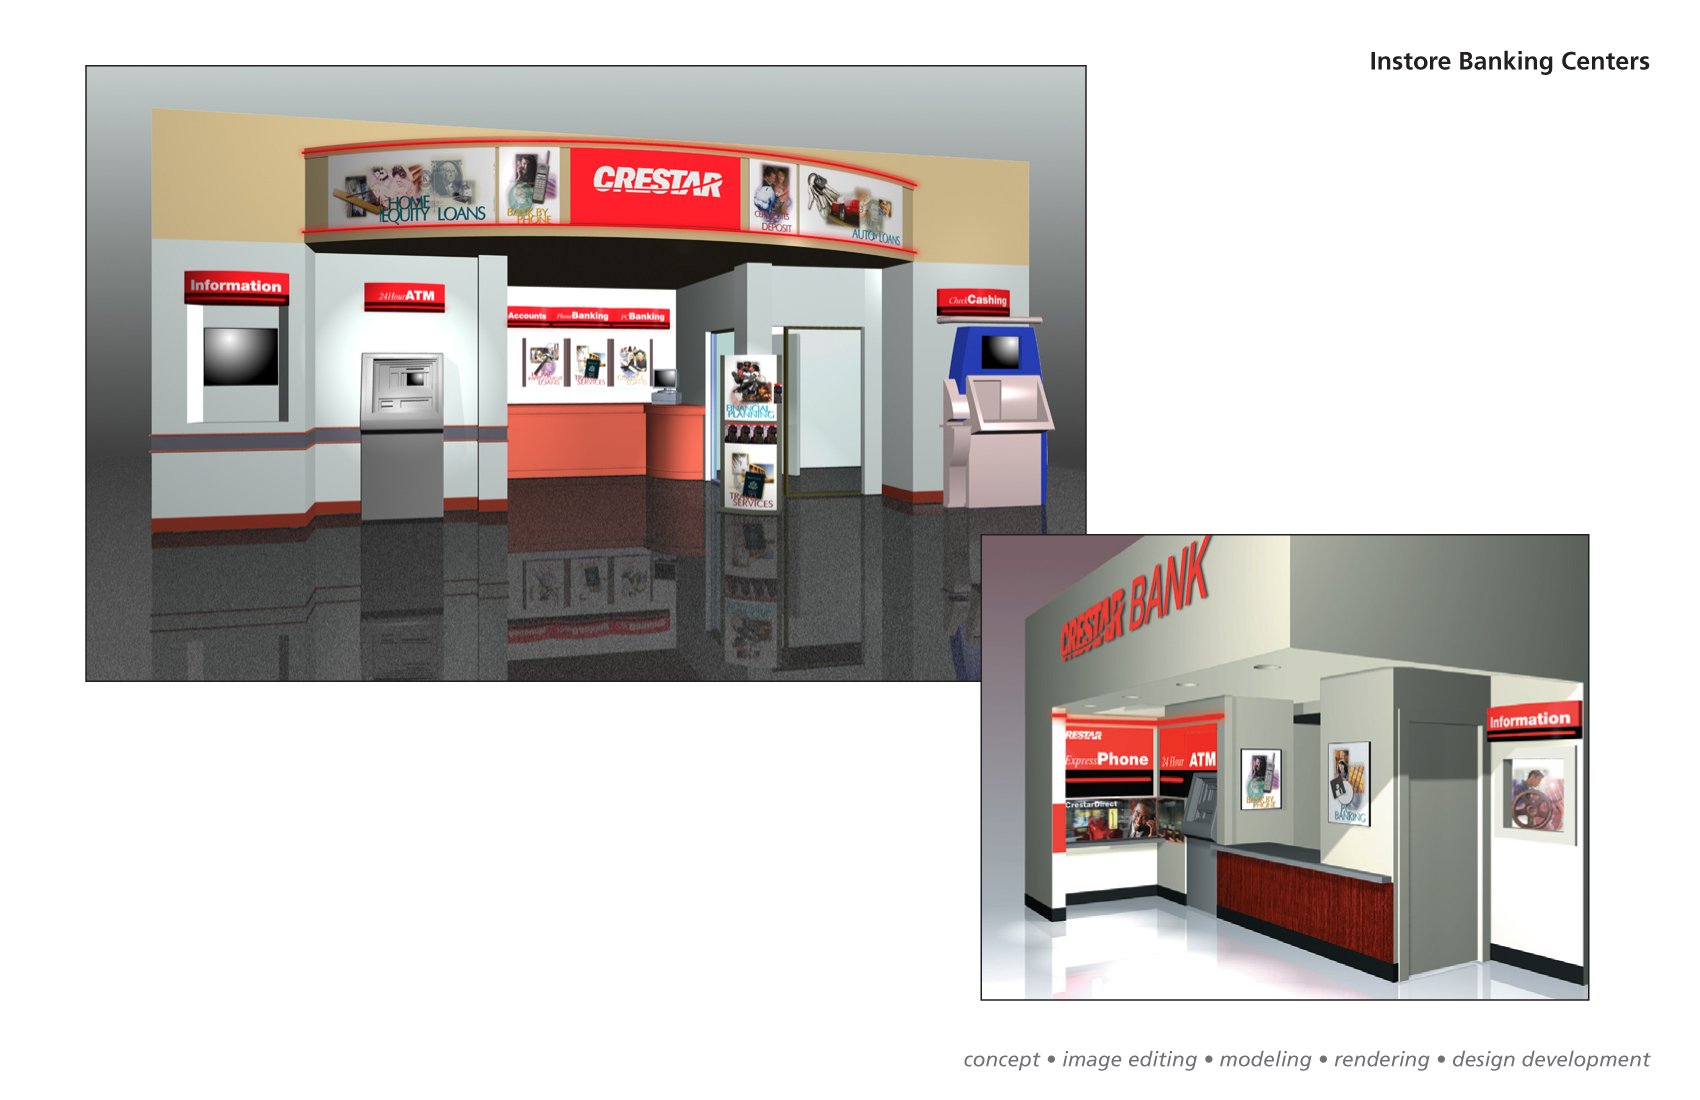 Instore Remote Banking By Allan Amioka At Coroflot Com